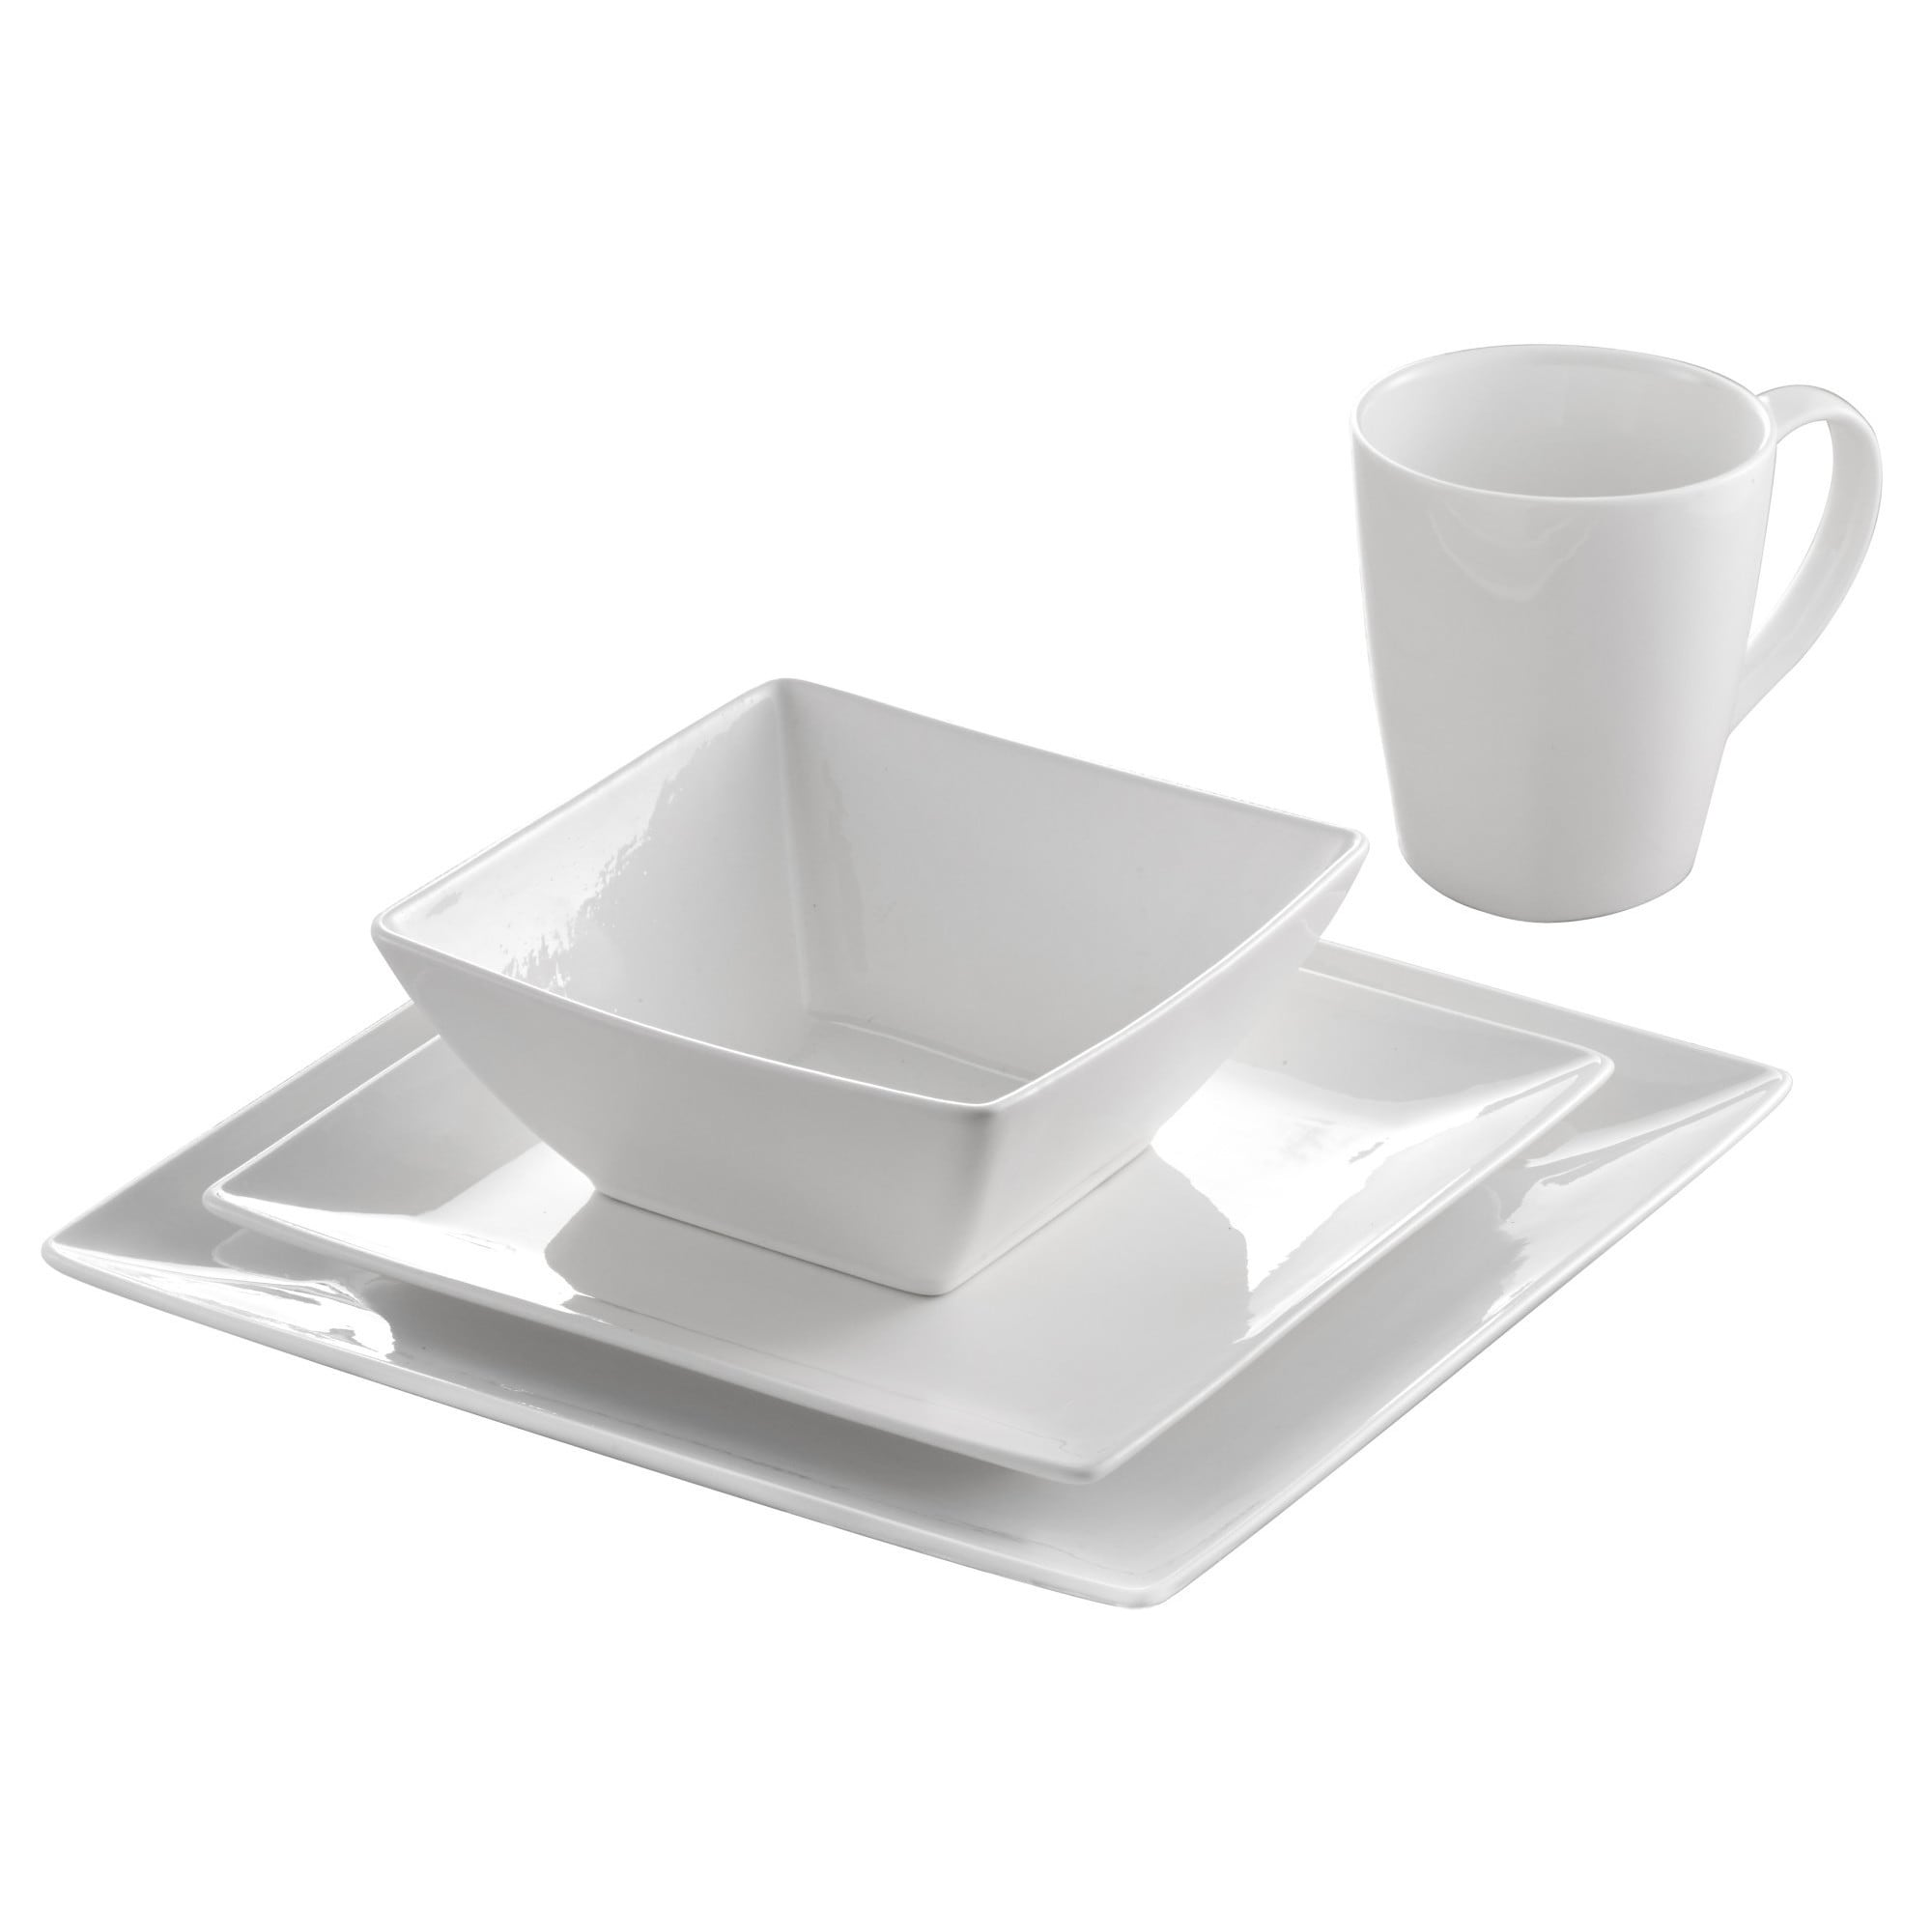 Roscher 32-Piece Pure Square Dinnerware Set - Free Shipping Today - Overstock.com - 25687392  sc 1 st  Overstock.com & Roscher 32-Piece Pure Square Dinnerware Set - Free Shipping Today ...